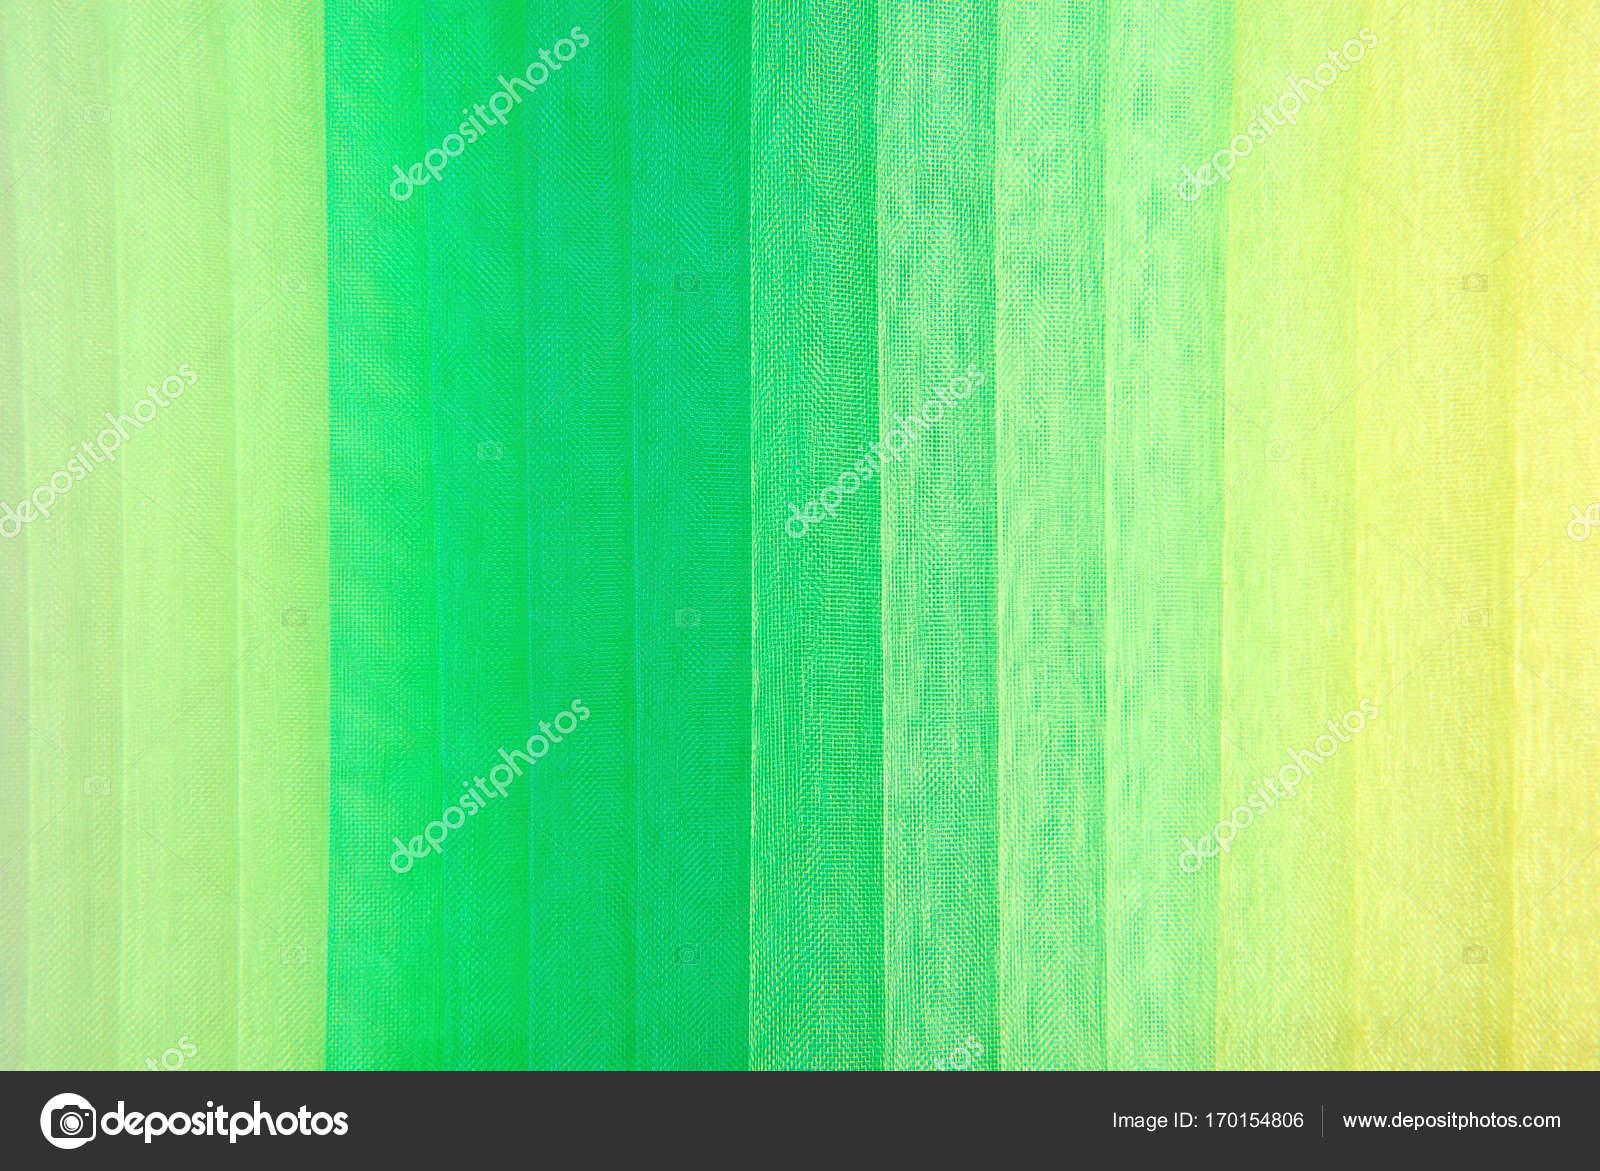 olika gröna färger